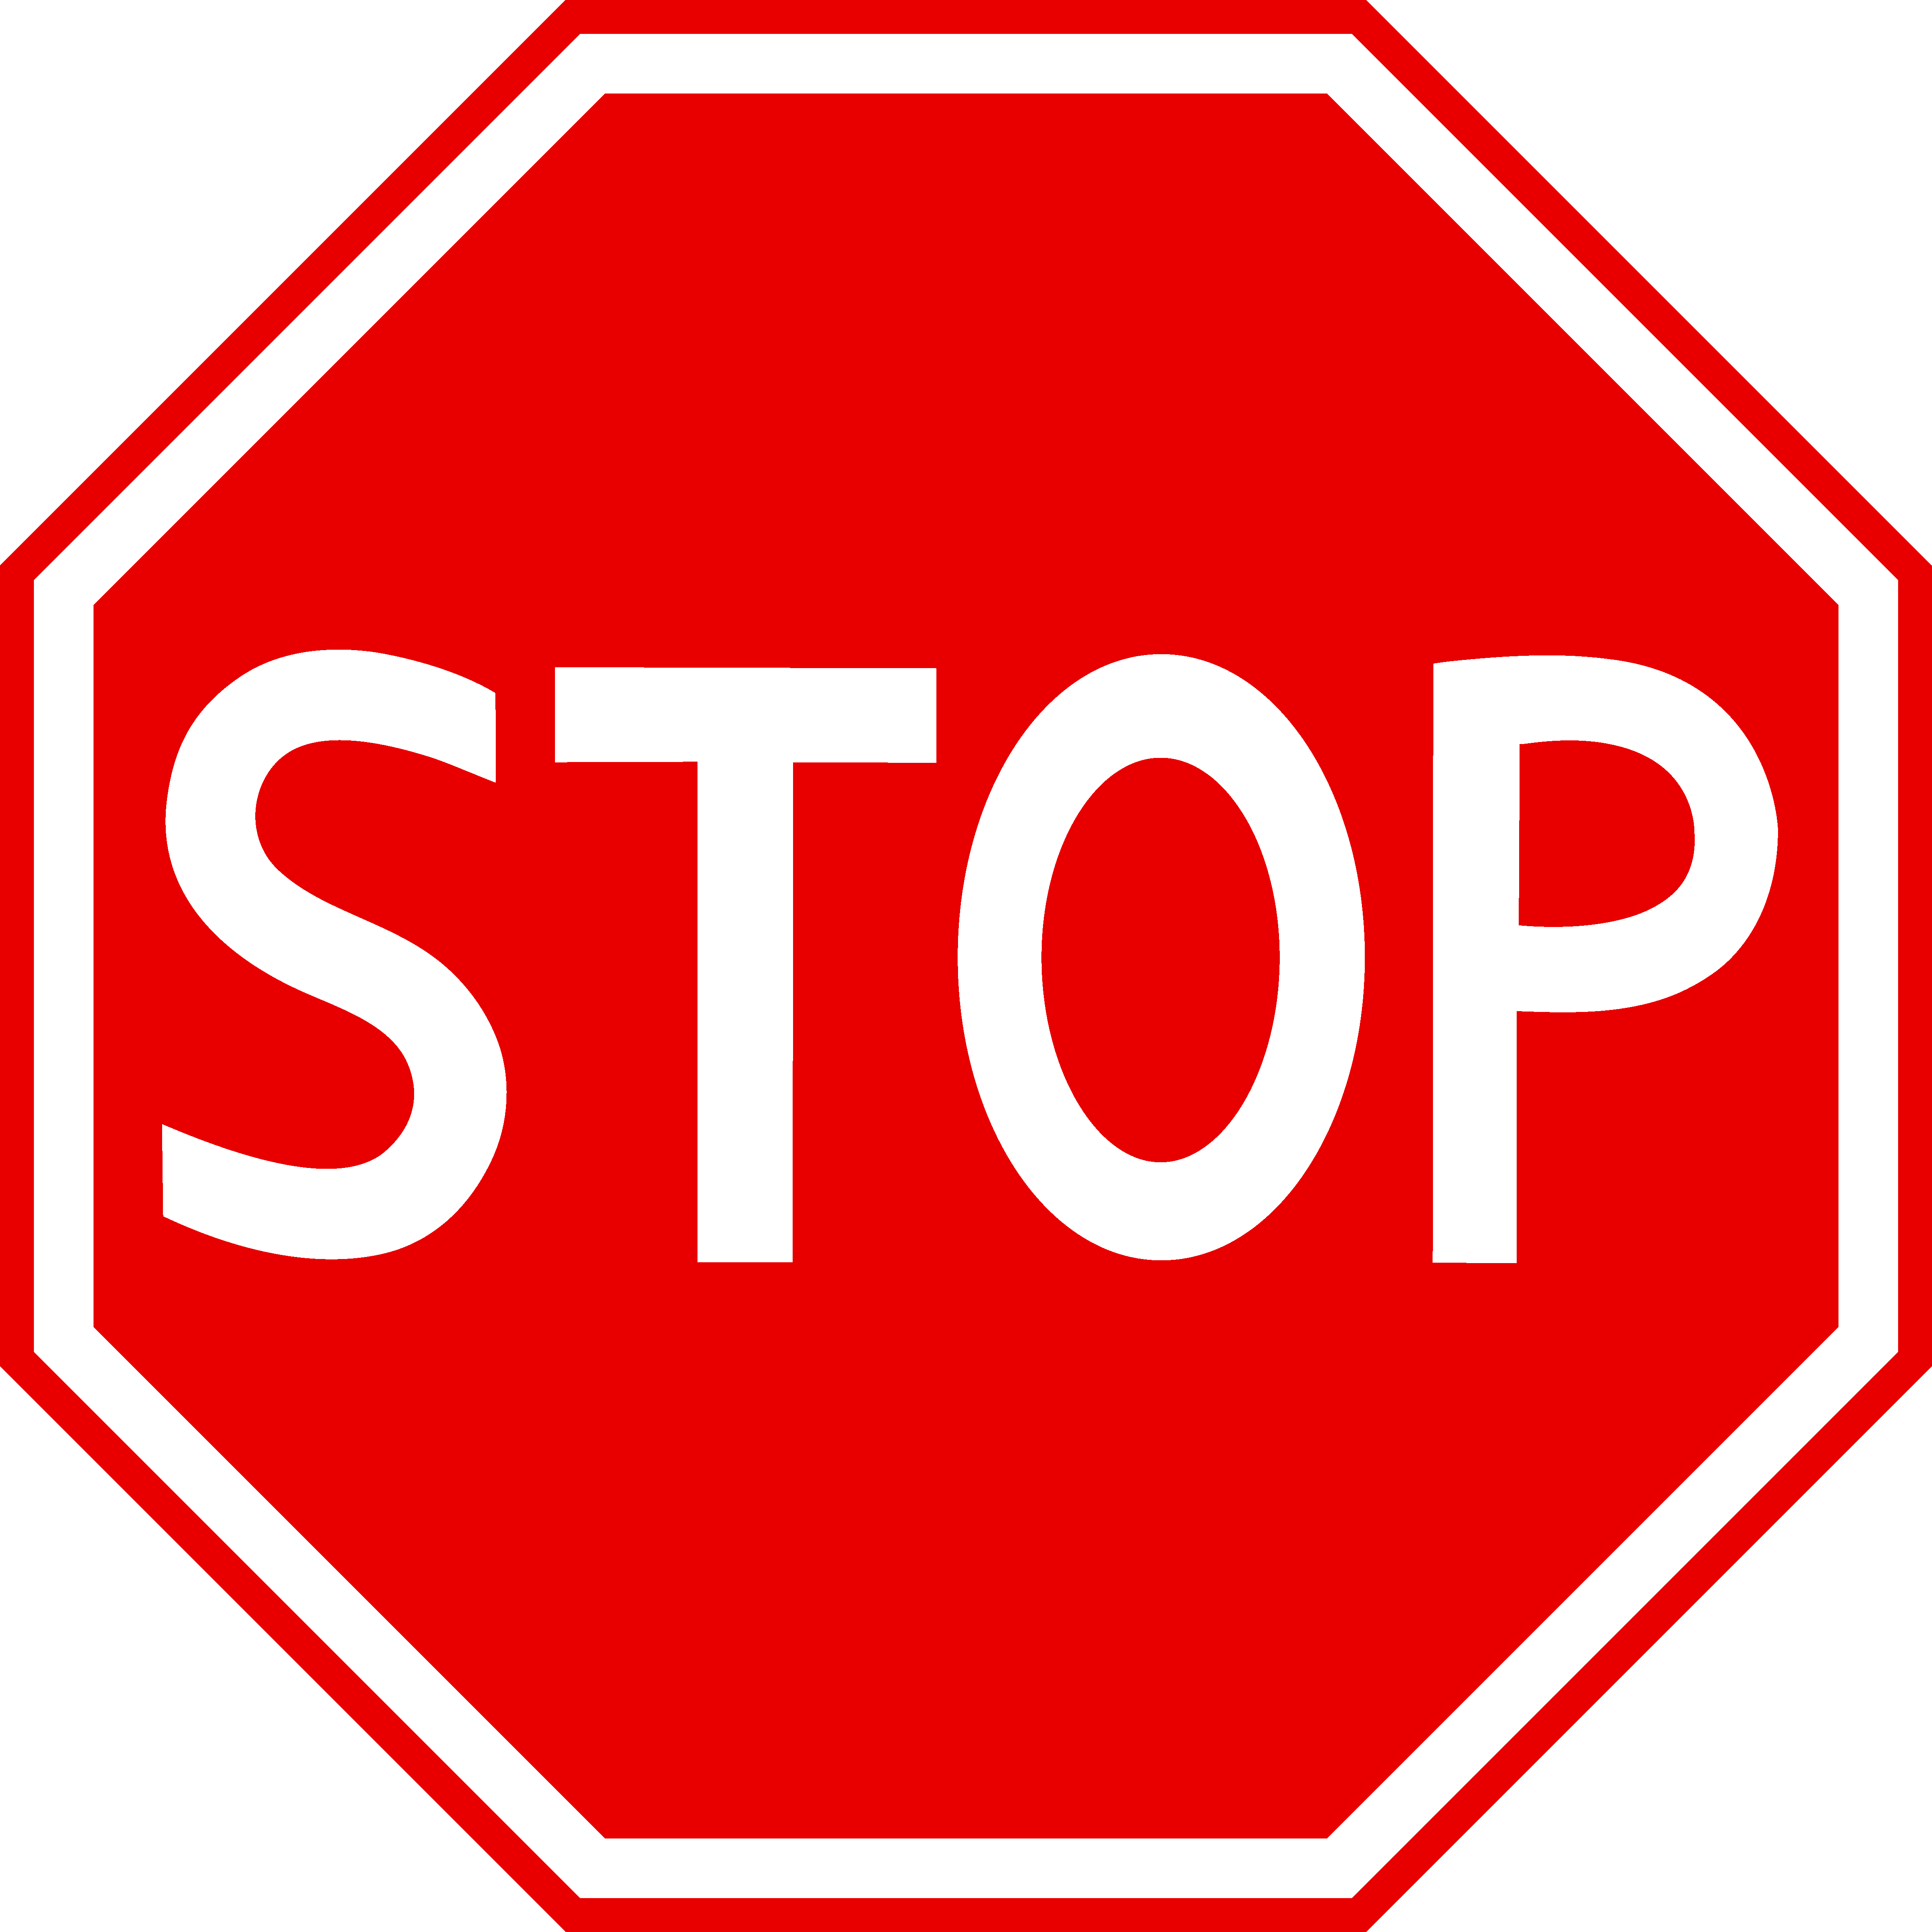 Stop sign clip art. Dollar clipart sigh